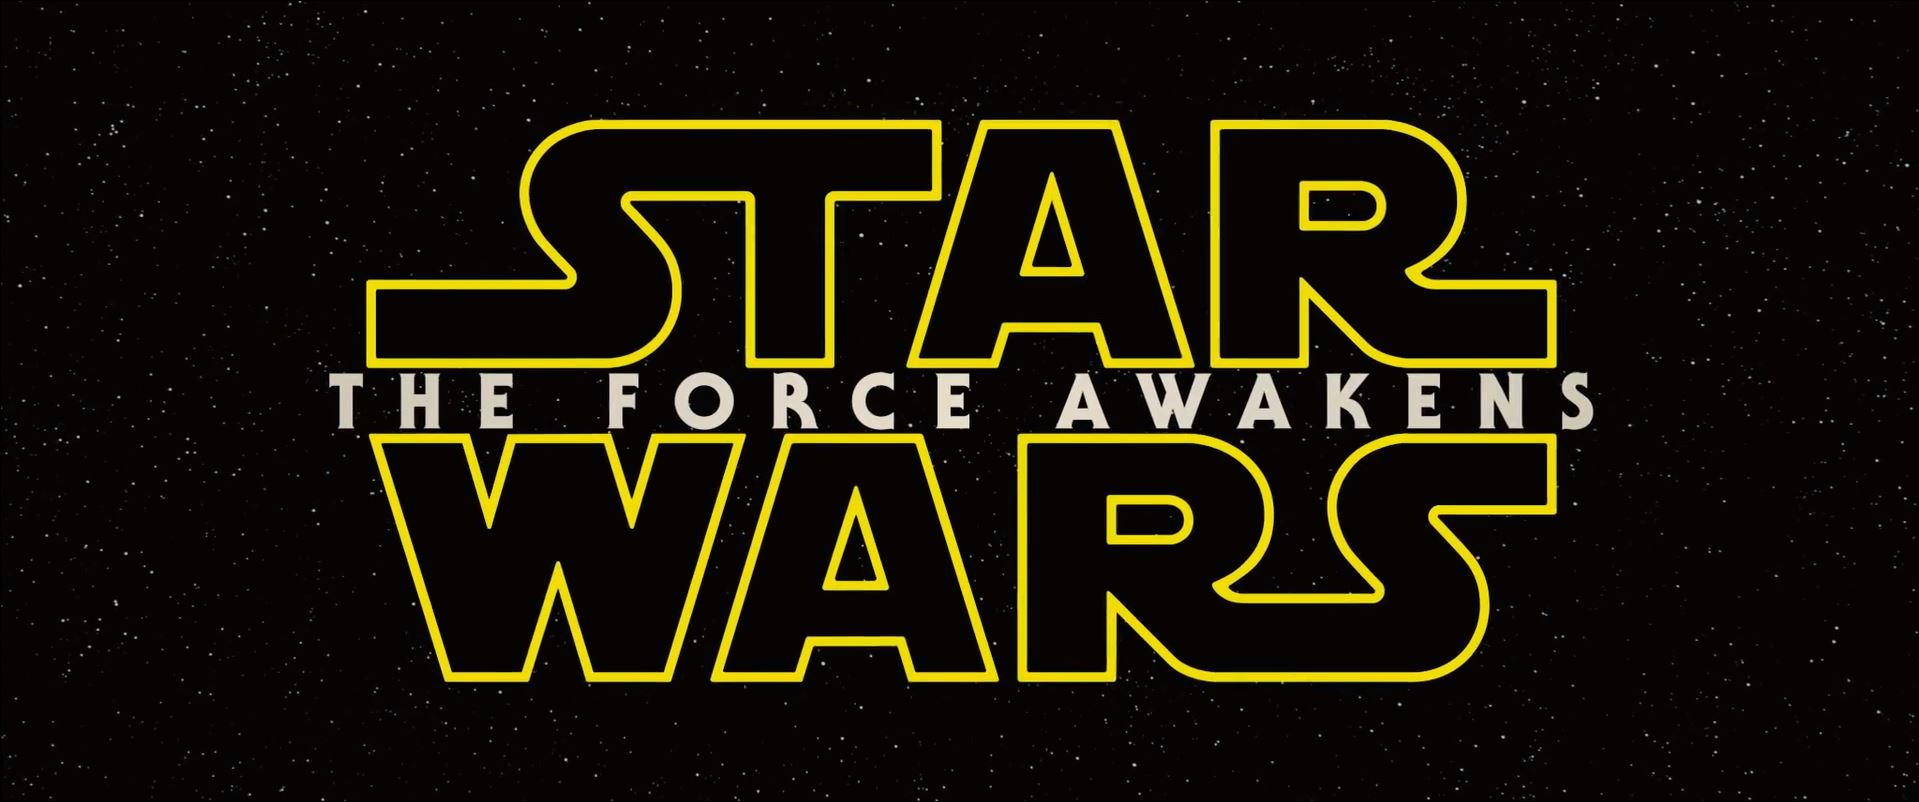 Star Wars The Force Awakens Community Fanpage